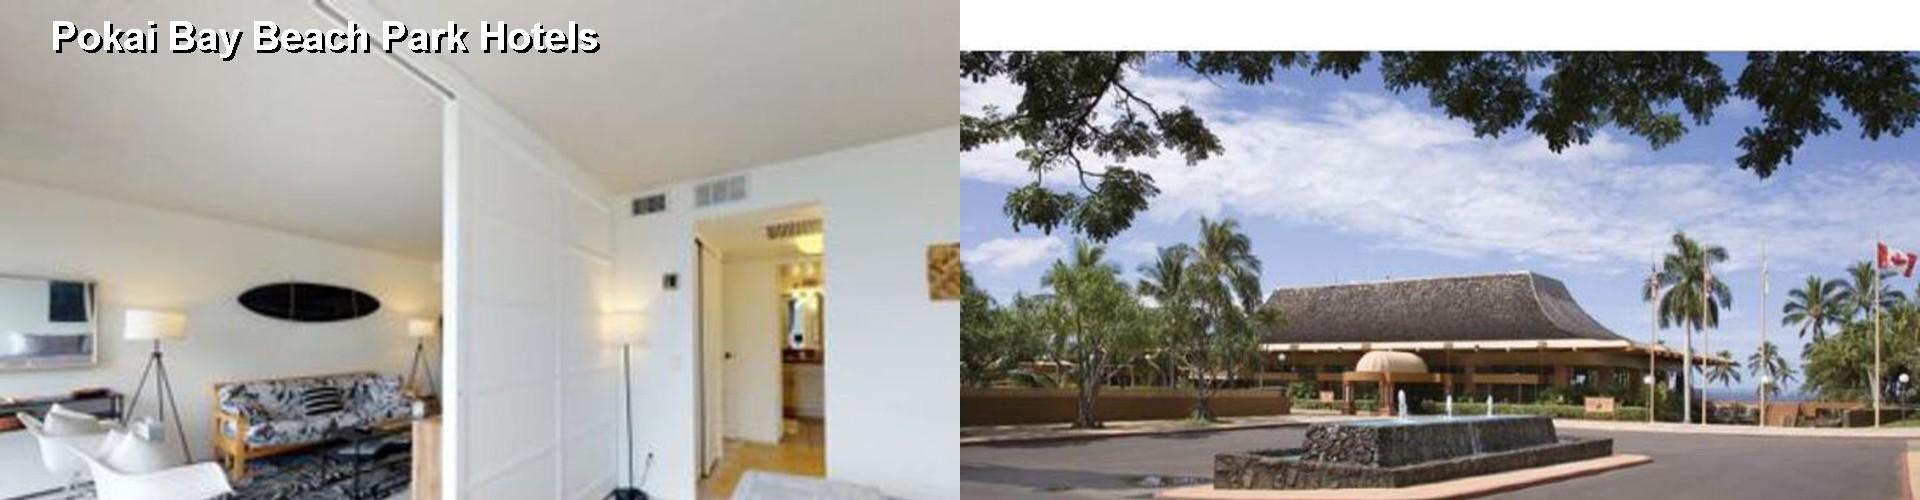 5 Best Hotels Near Pokai Bay Beach Park